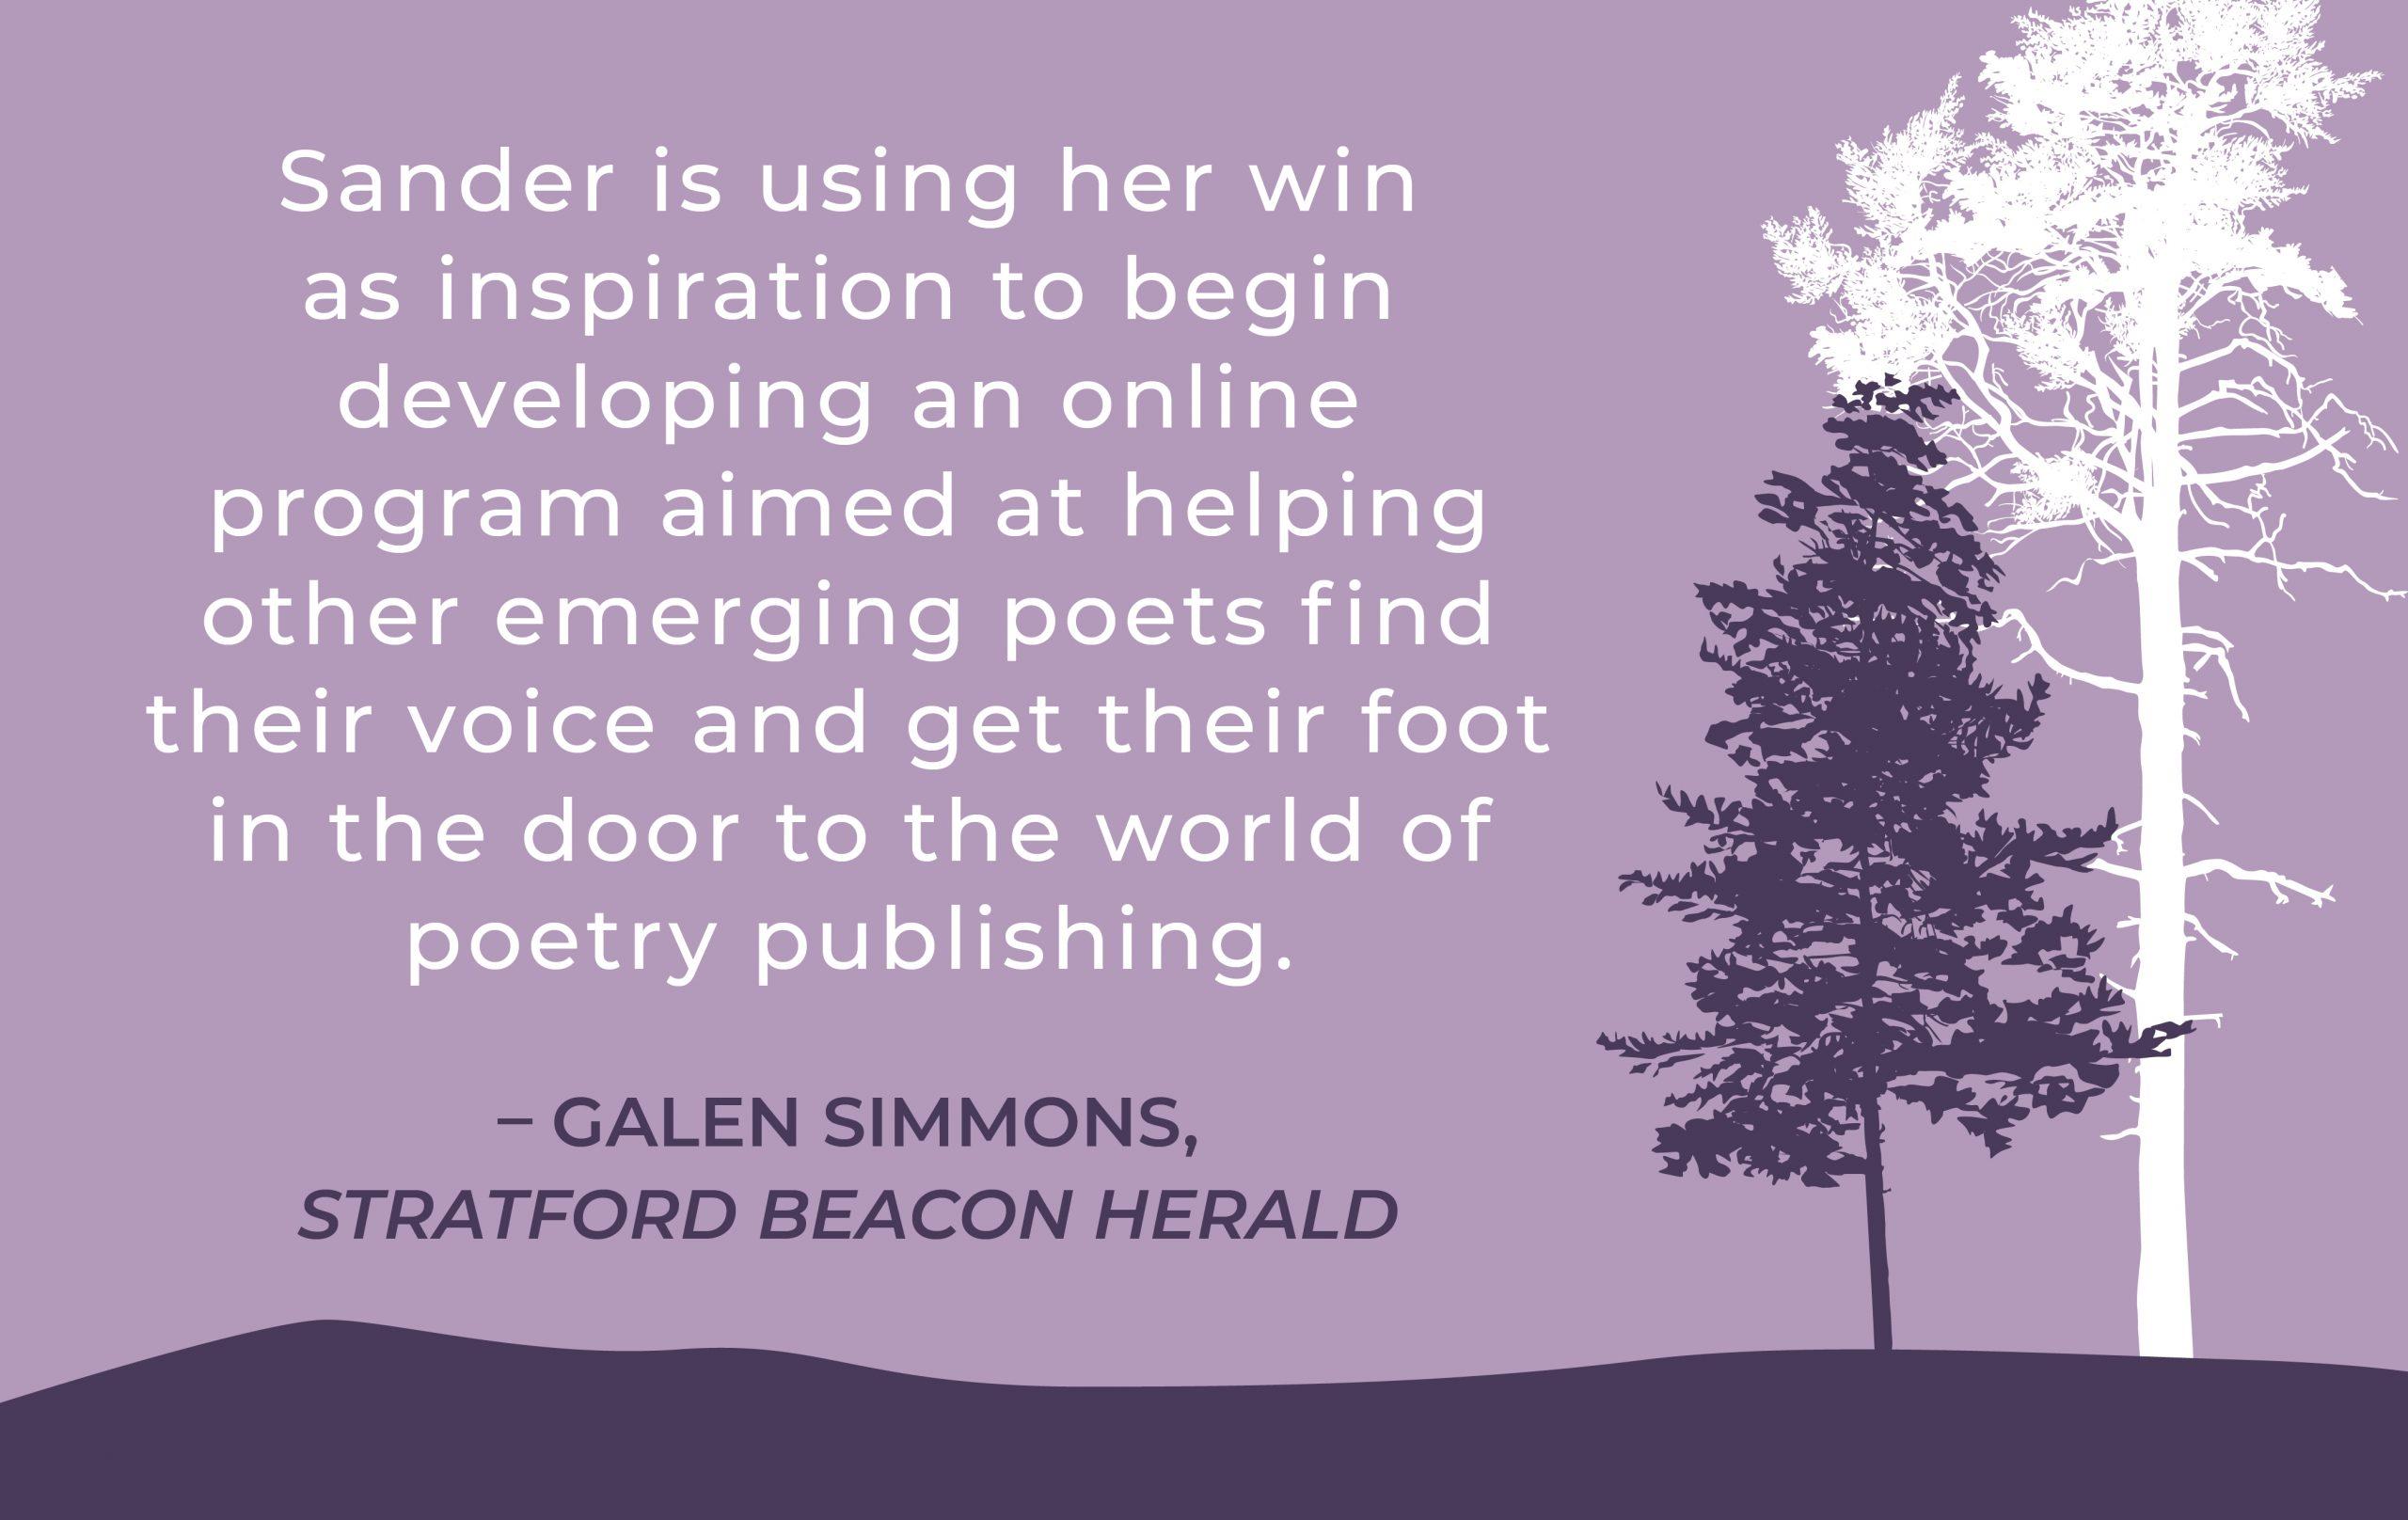 Heidi Sander Quote from Stratford Beacon Herald